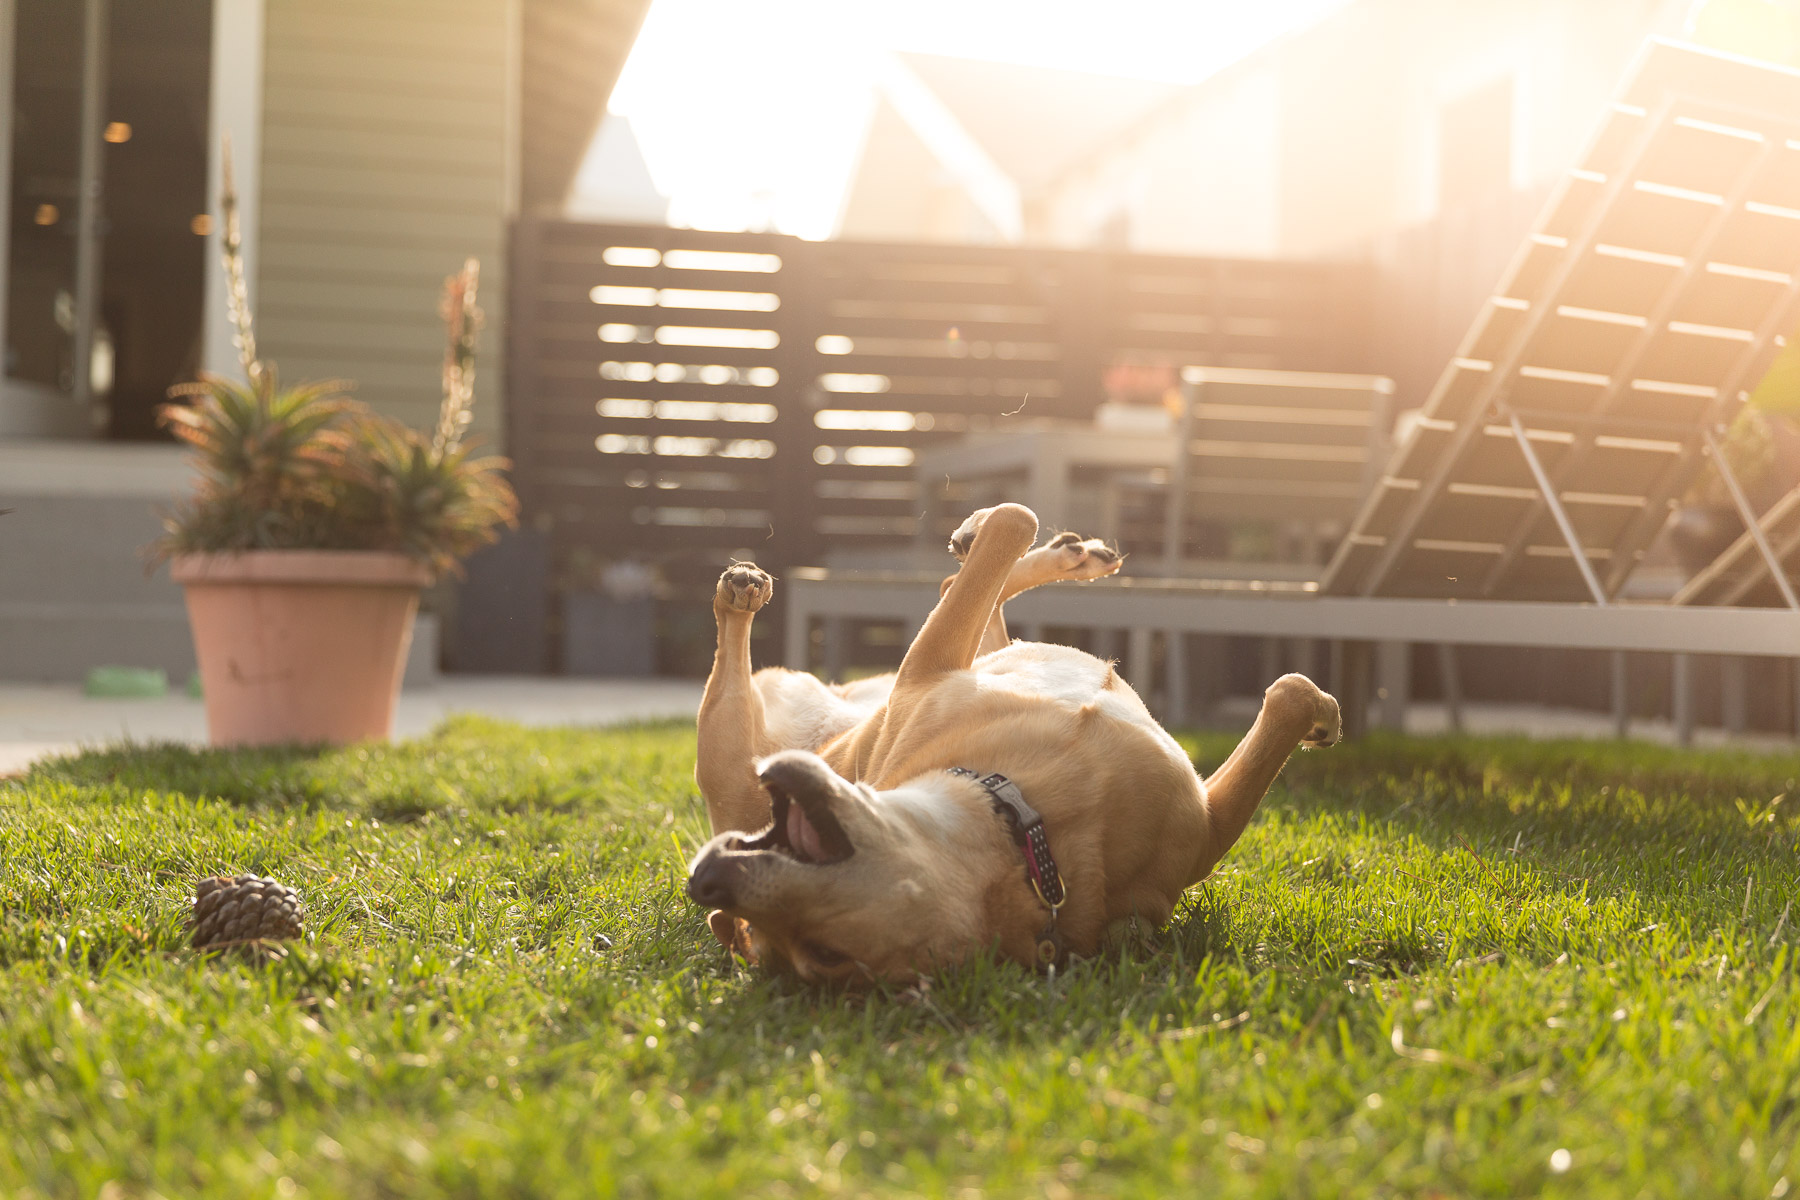 outdoor-dog-photography-no-flash